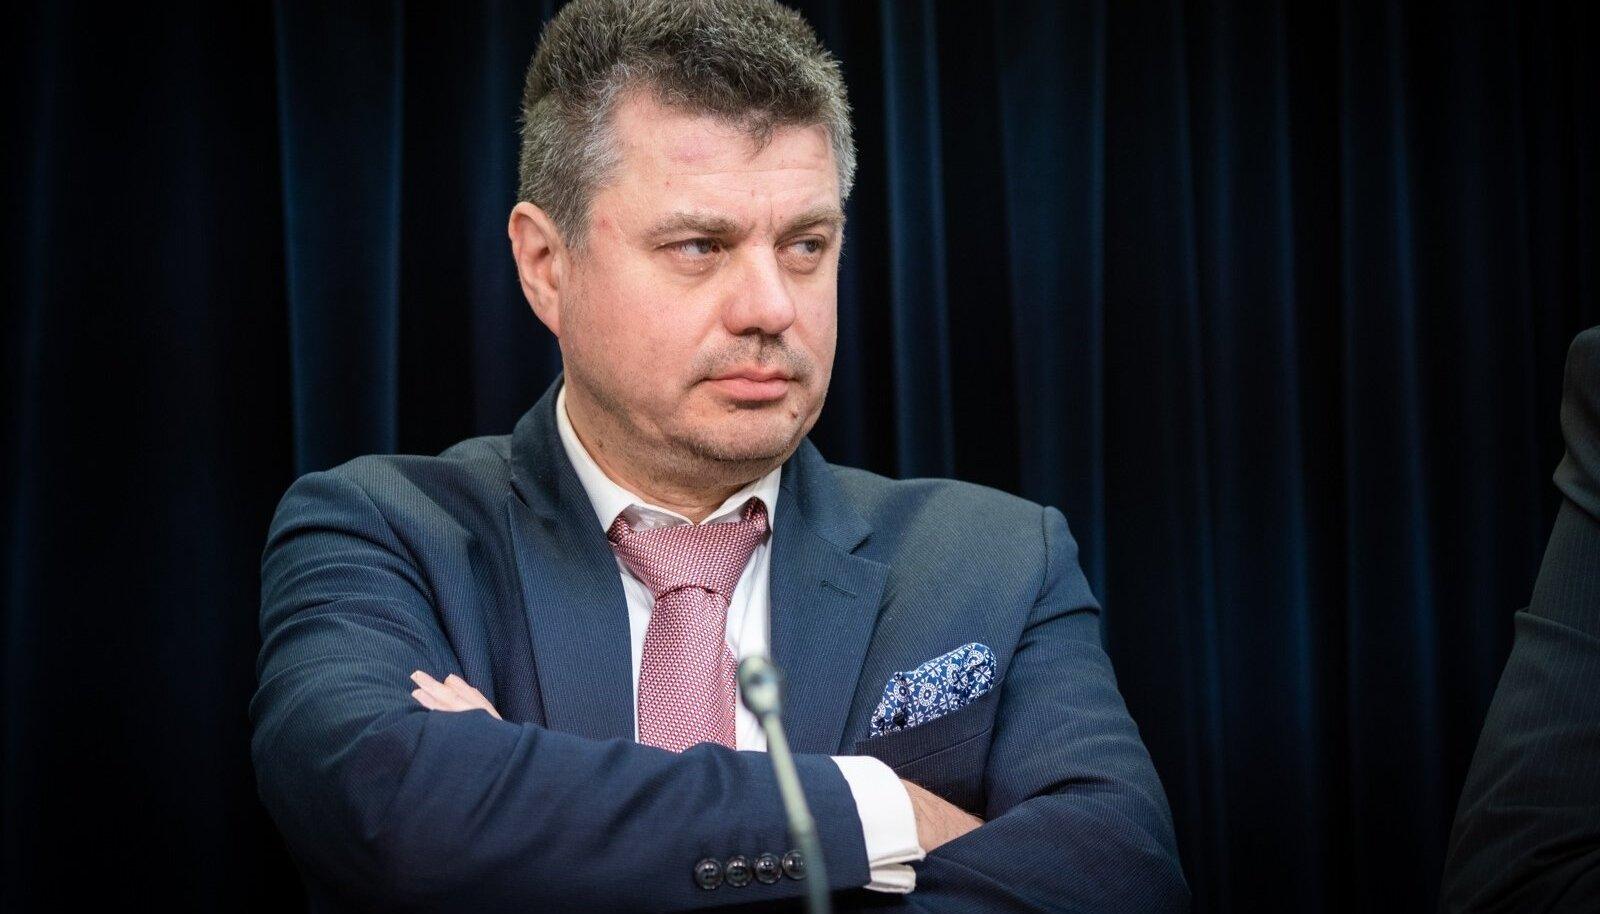 Eesti välisminister Urmas Reinsalu